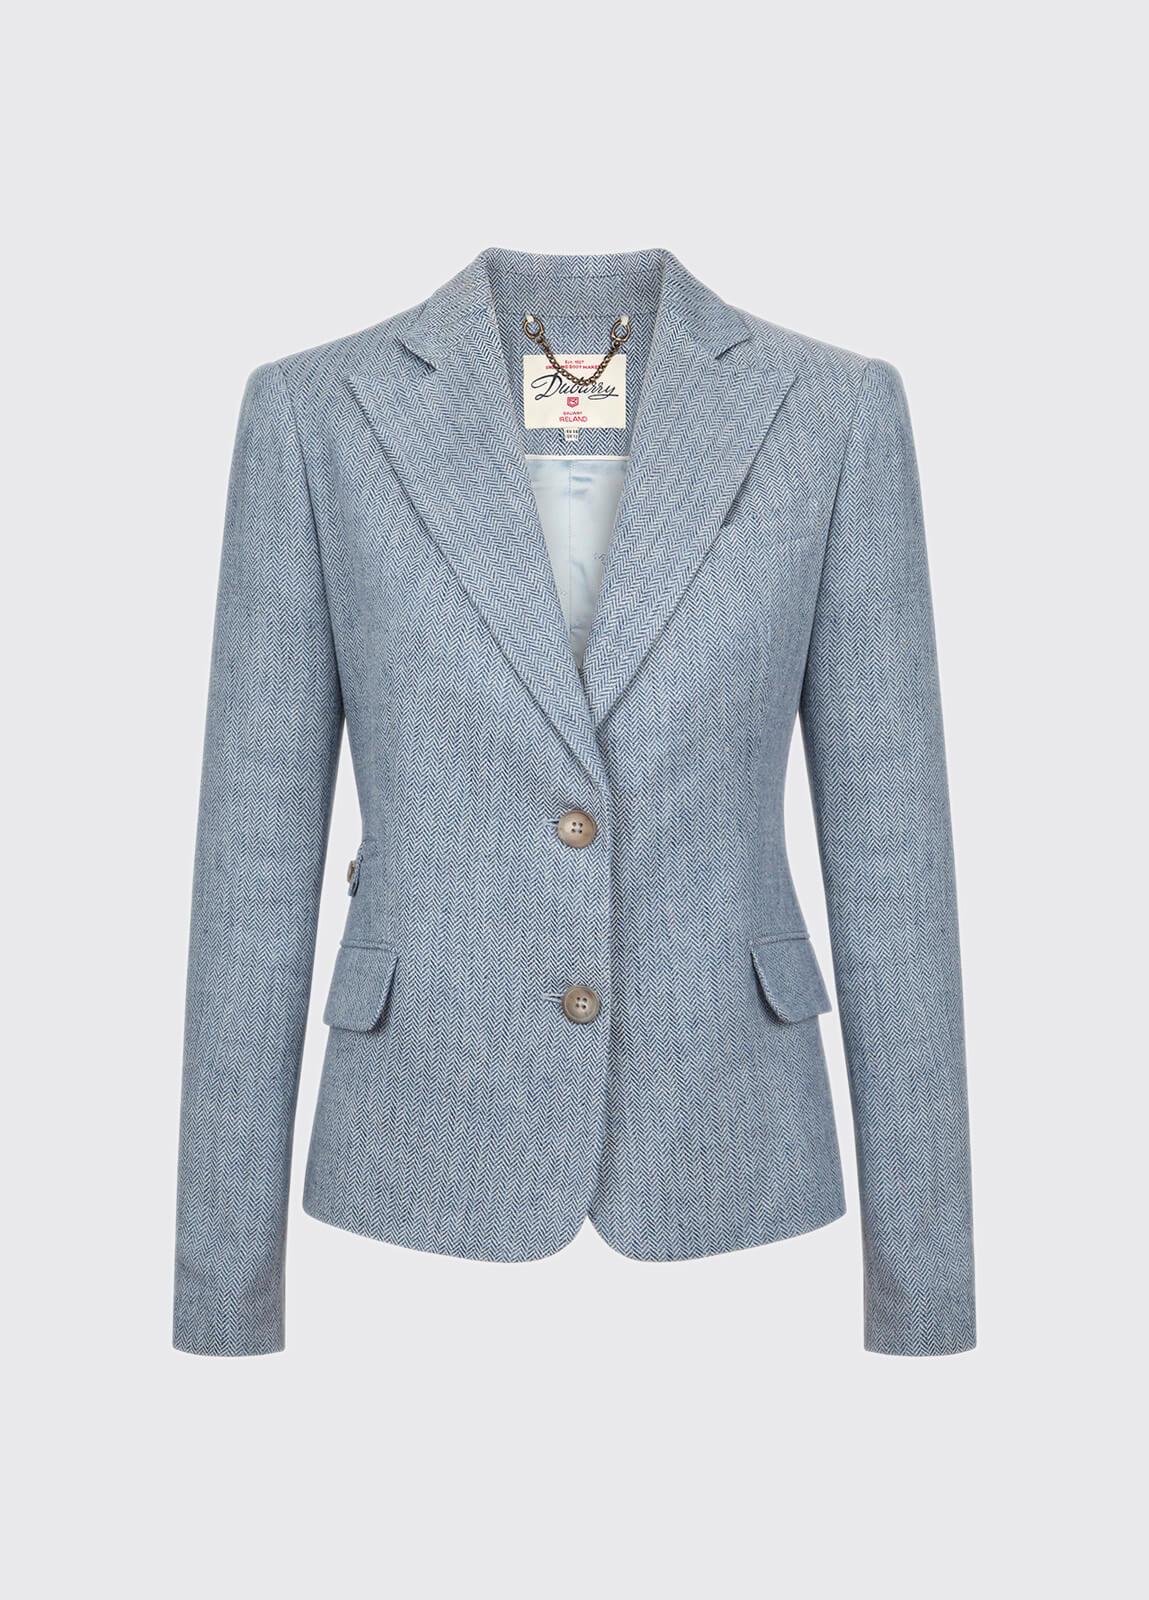 Blairscove Women's Linen Blazer - Blue